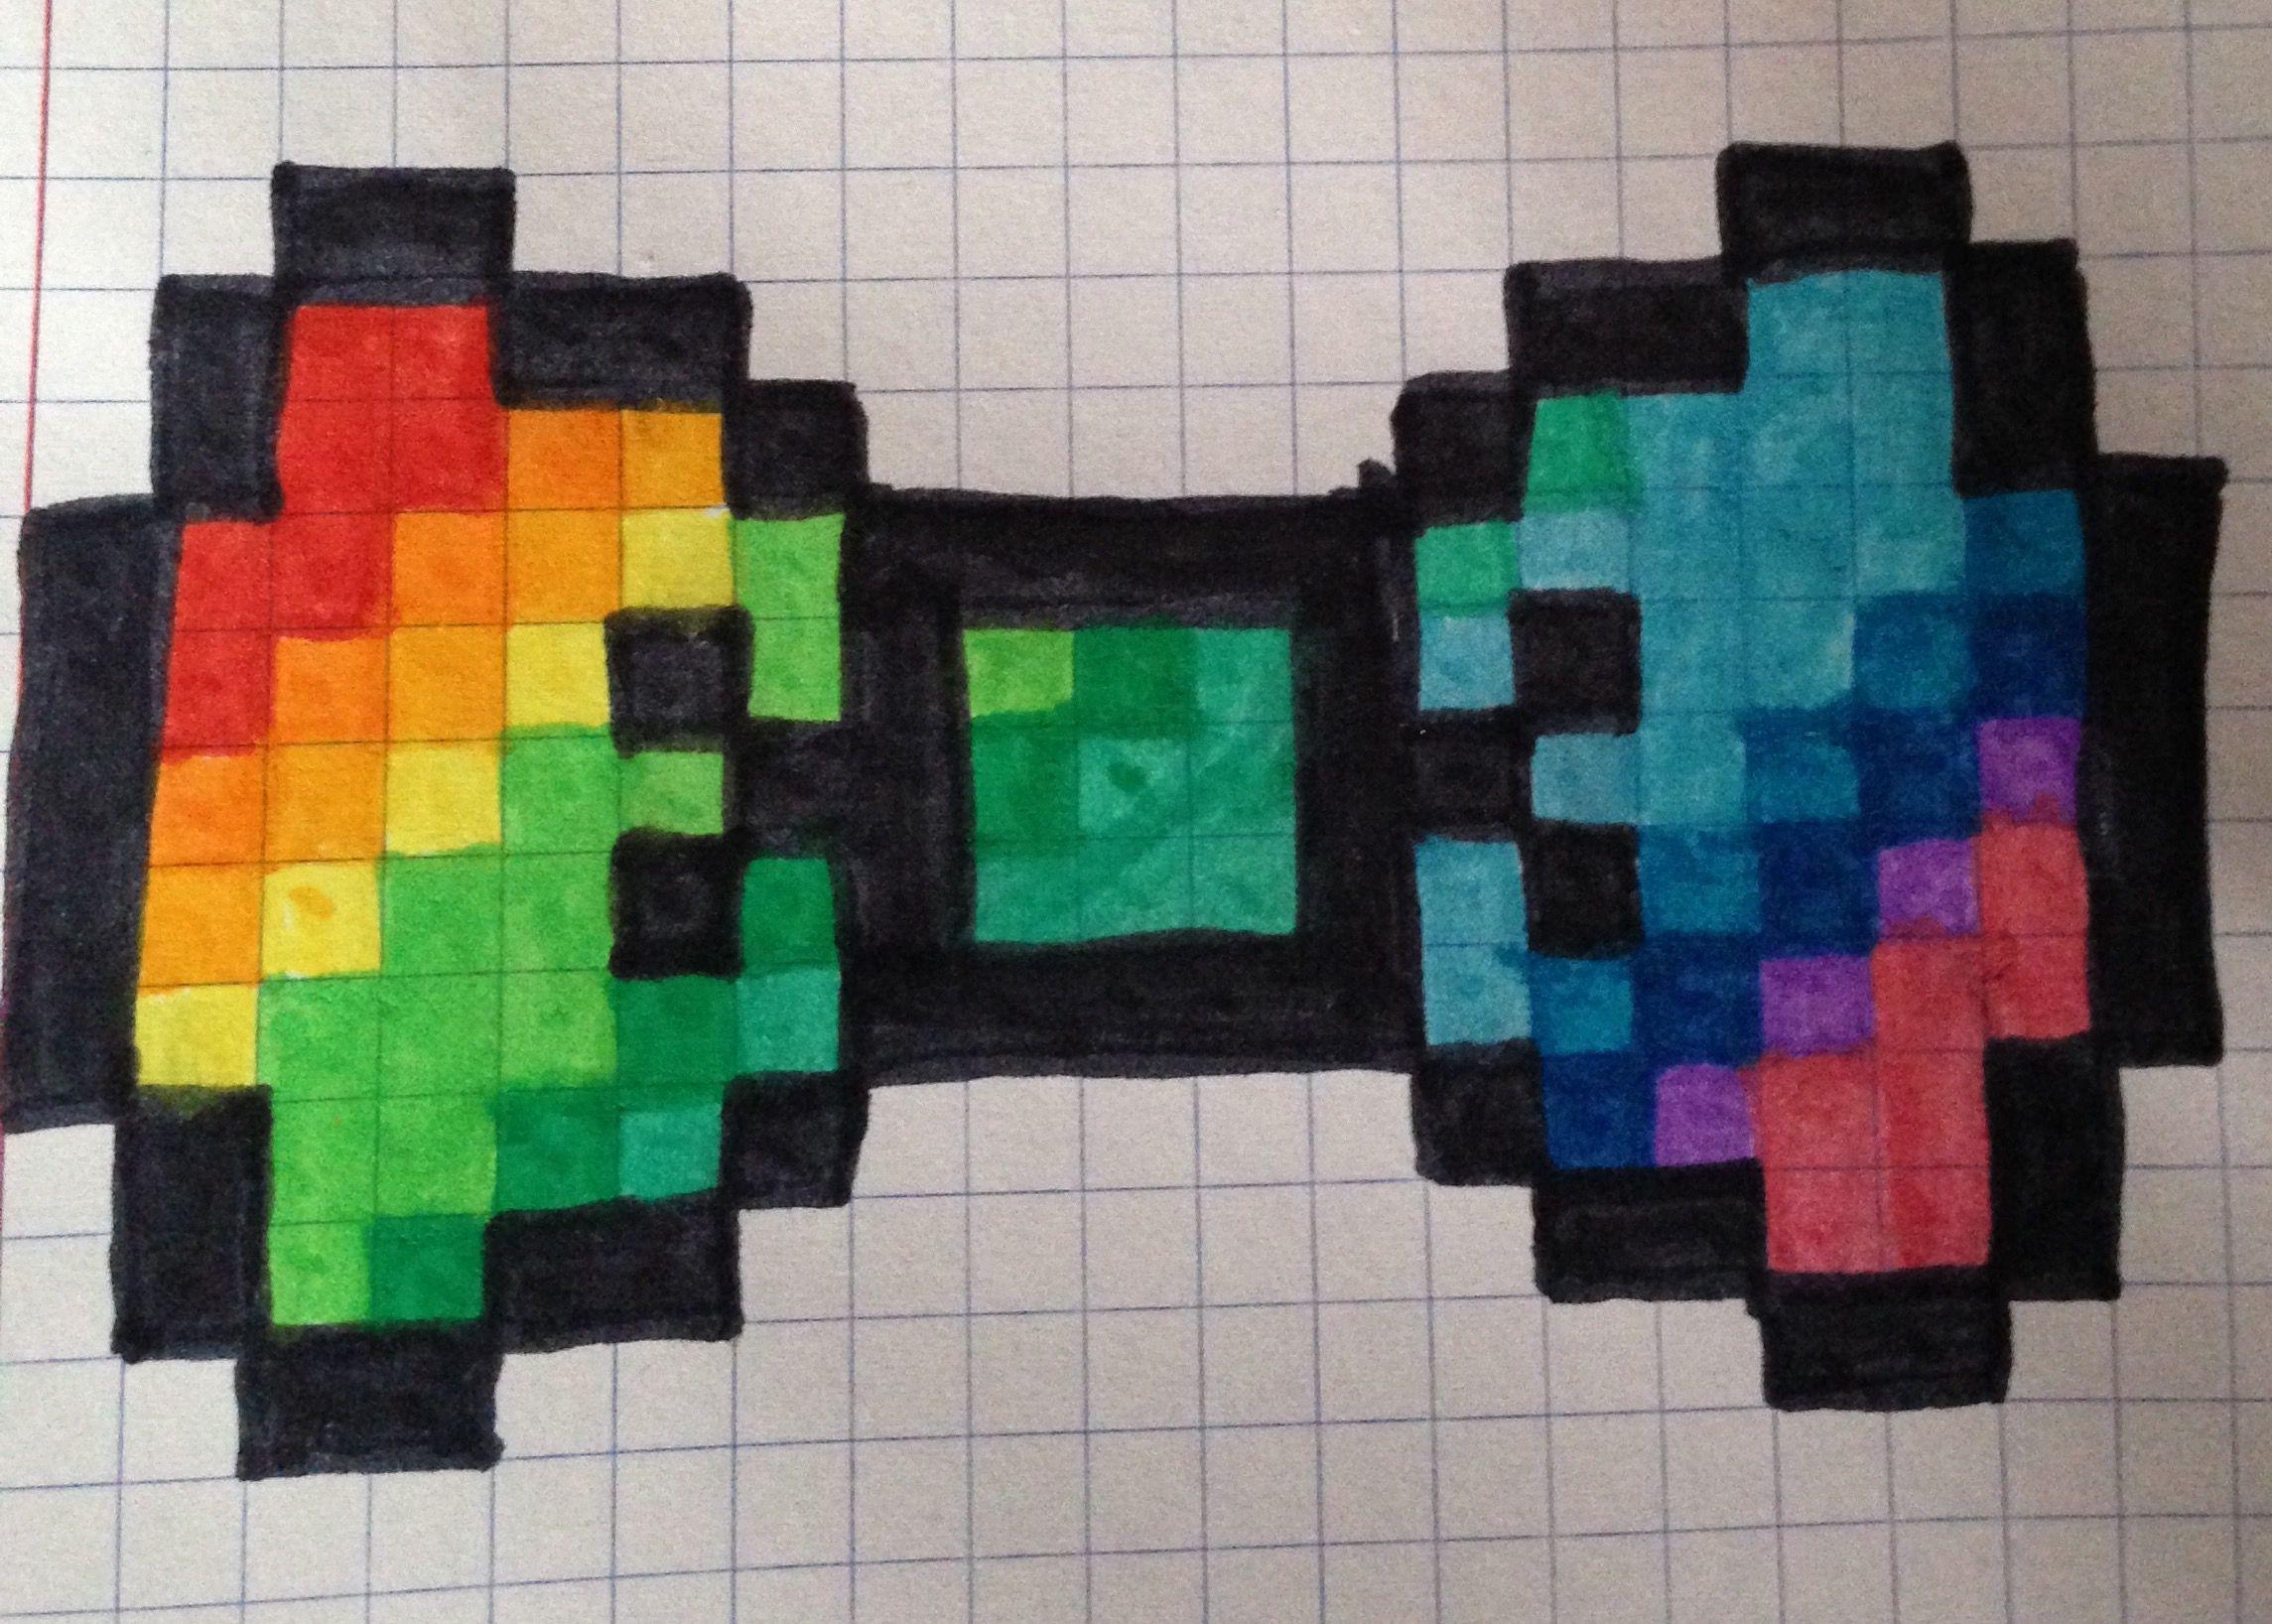 Papillon crafts fuse beads t Pixel Art Minecraft pixel art - Pixel Art Papillon